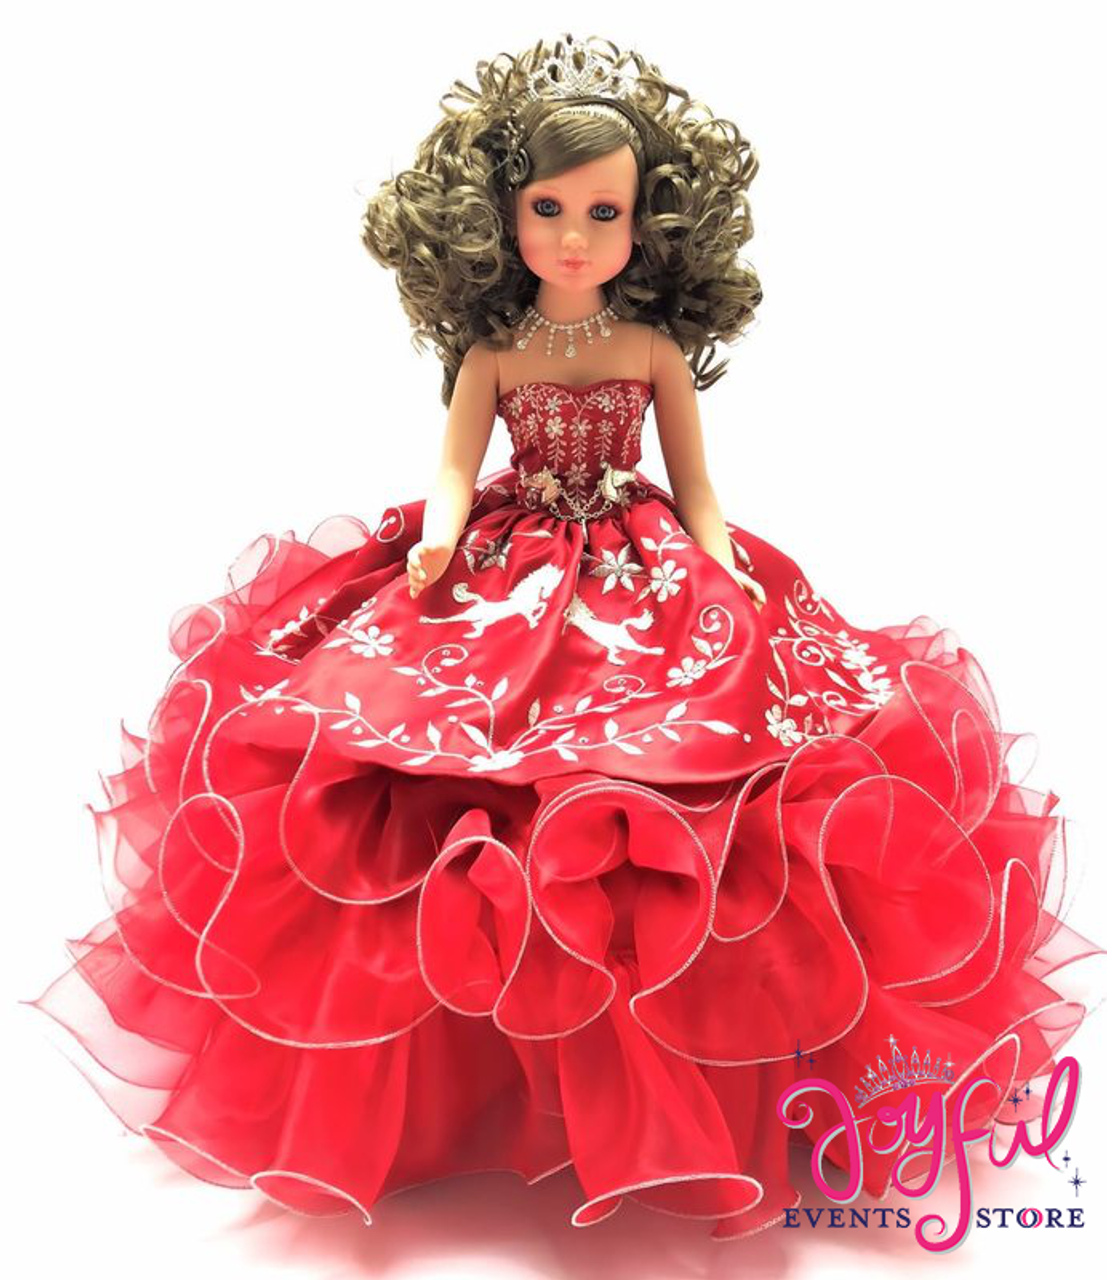 be11f9c3943 charra quinceanera dolls